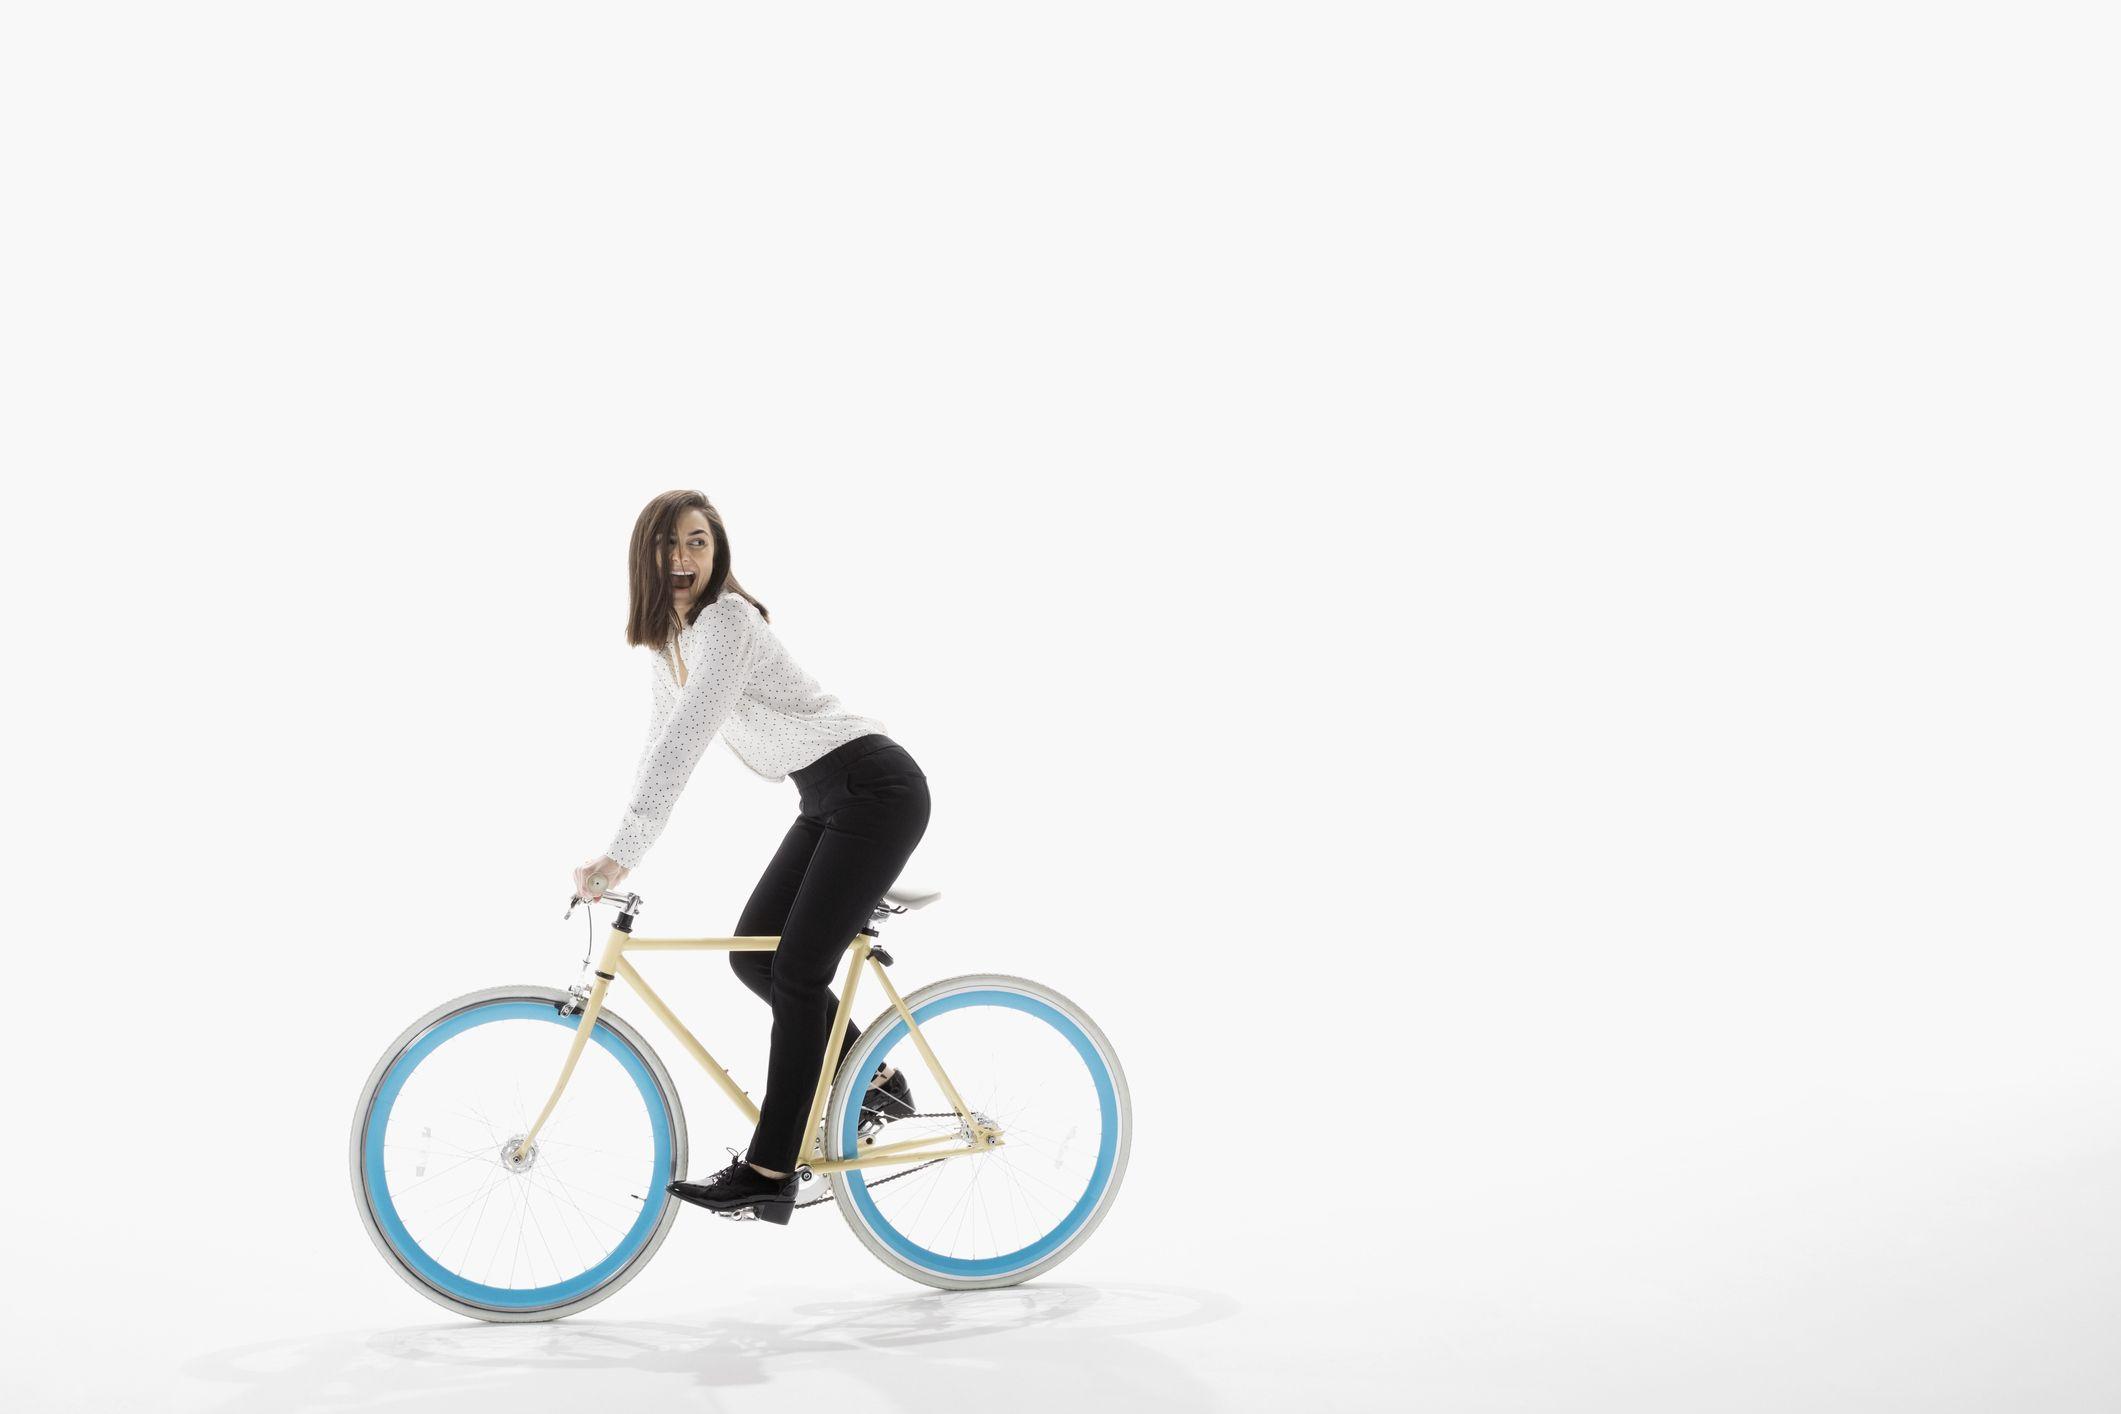 woman riding bike white background